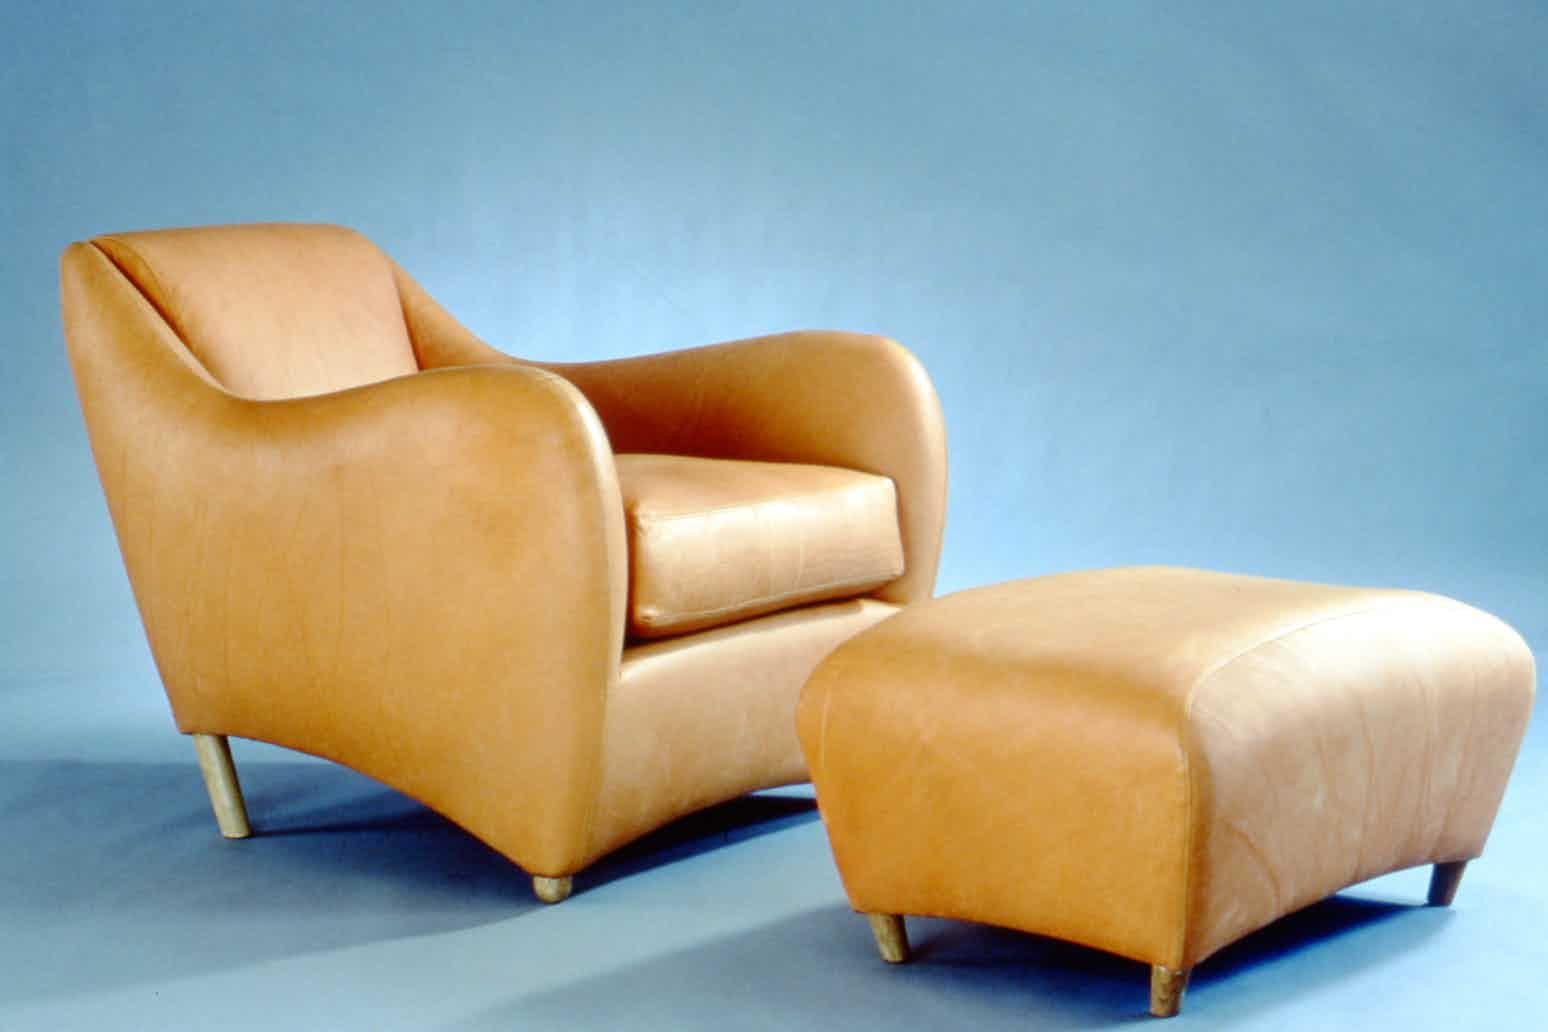 1990's early studio shoot of the Balzac armchair and ottoman.